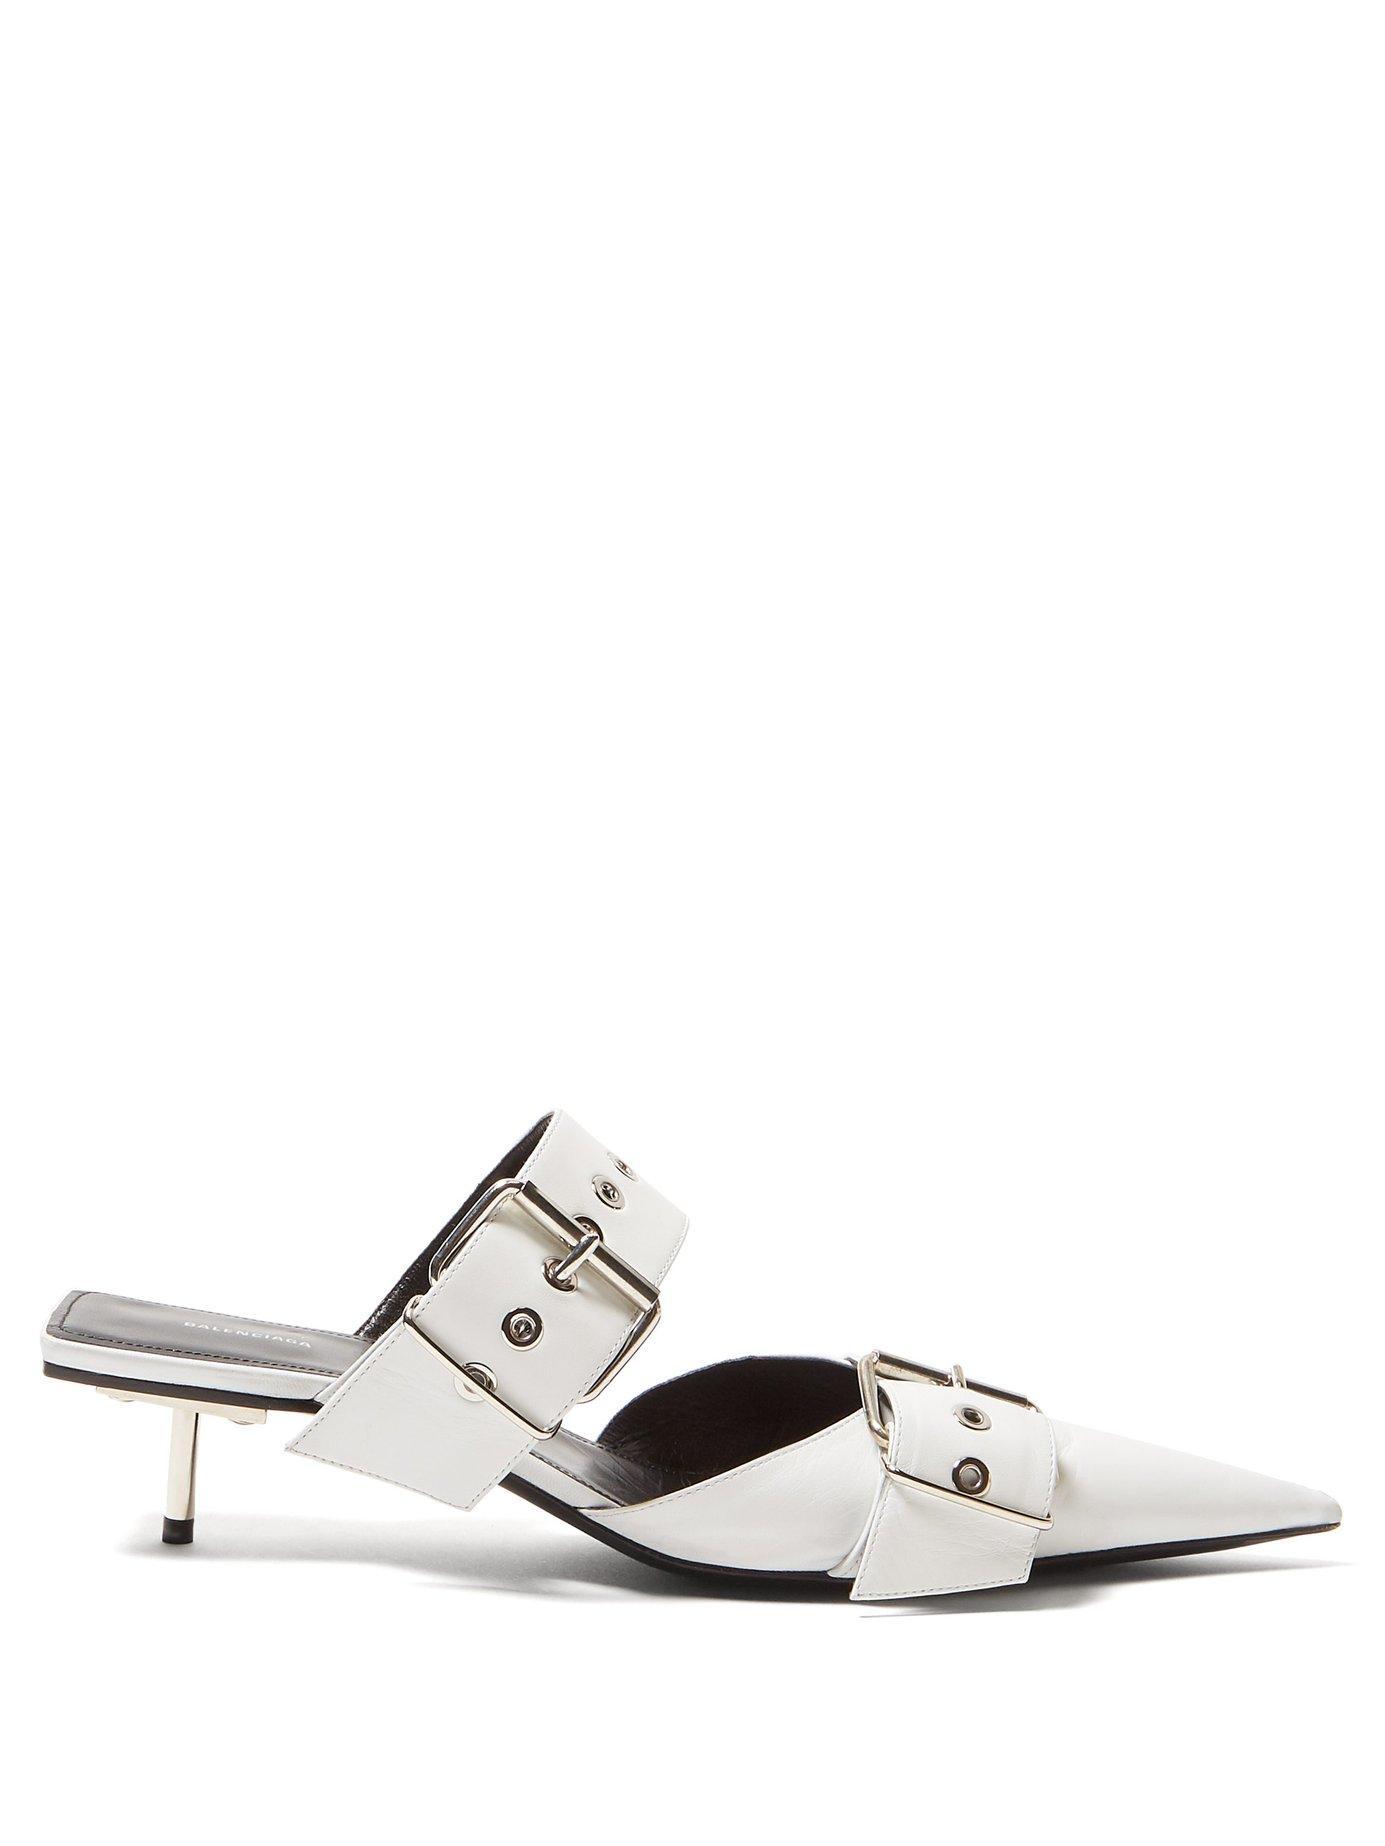 c49e513ce714 Lyst - Balenciaga Belt Buckle Leather Mules in White